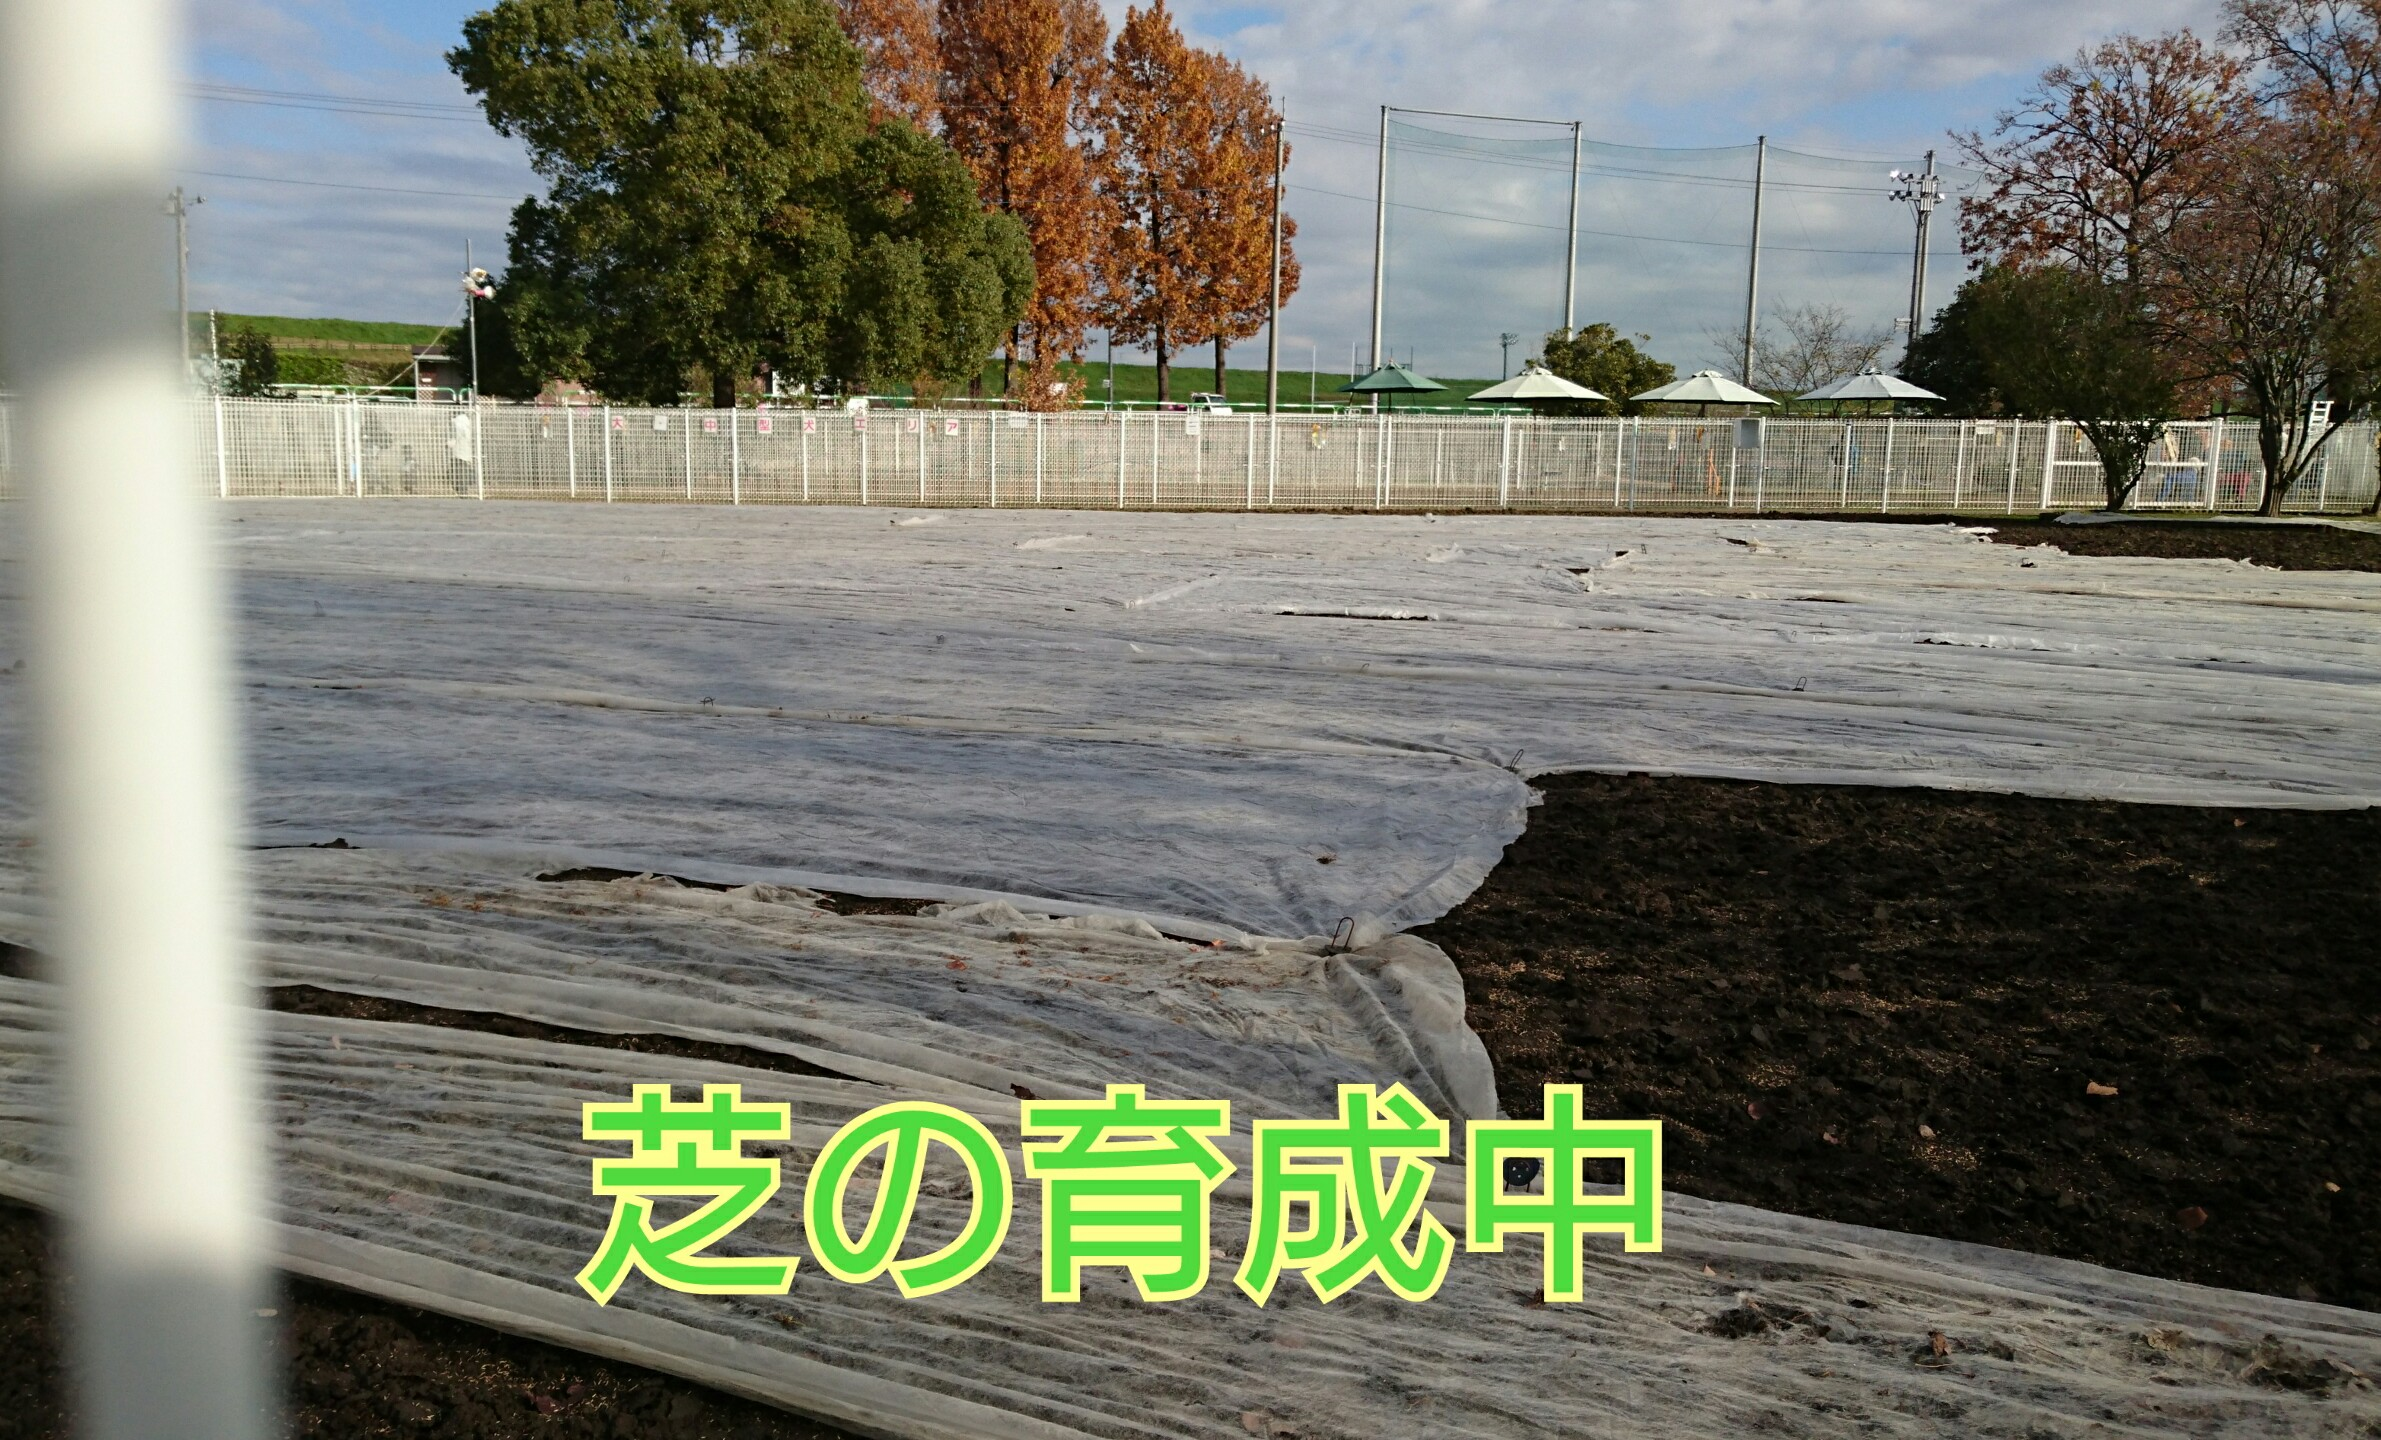 201612111209448a1.jpg